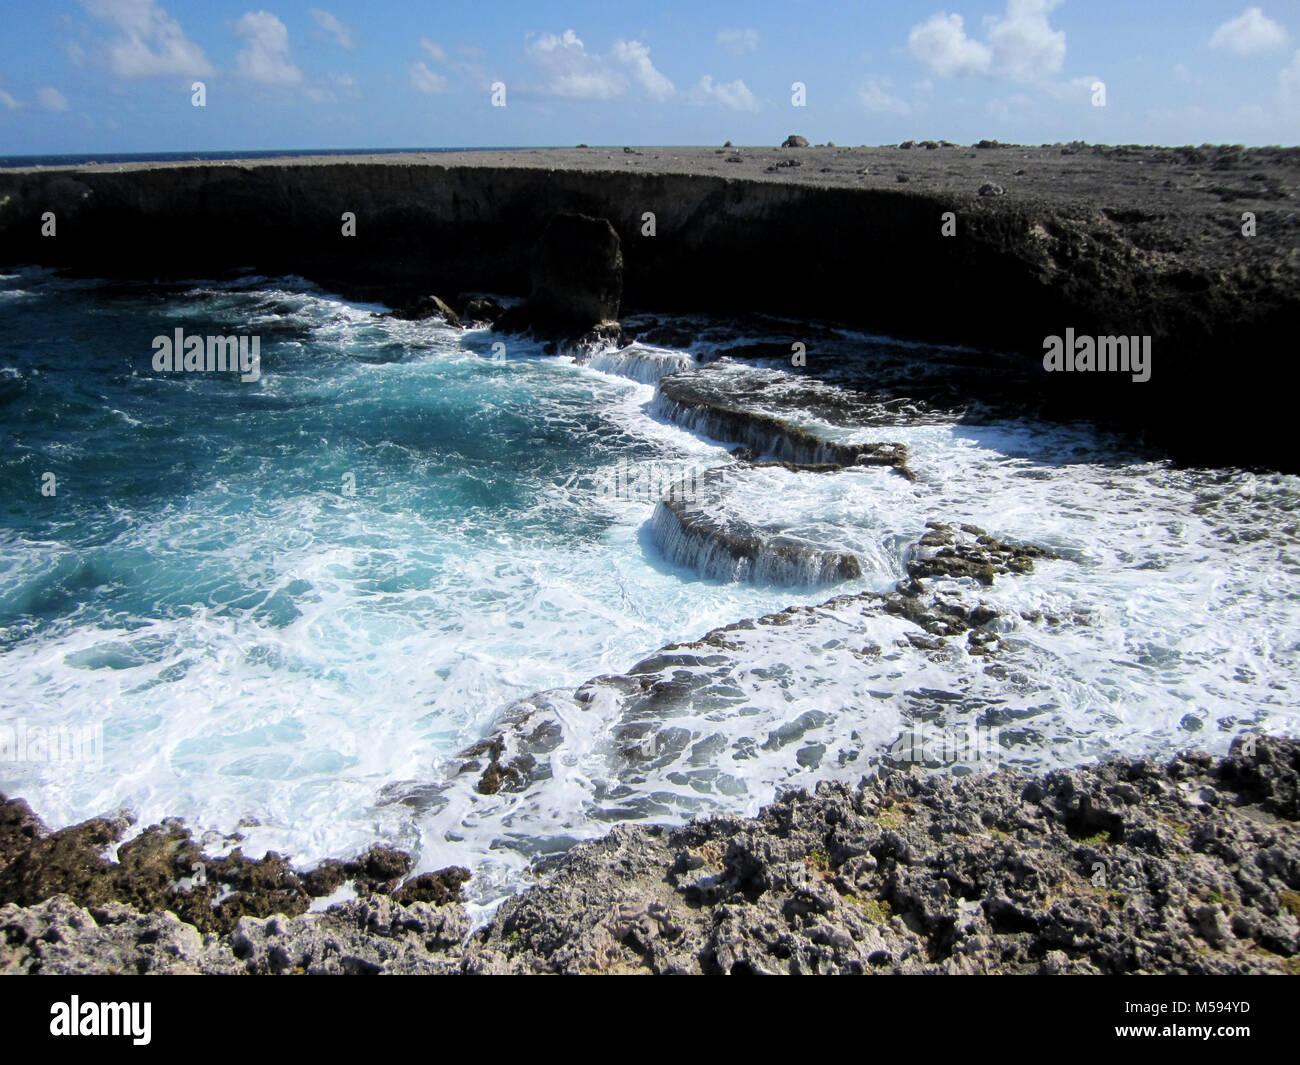 Ungestümes Meer an der felsigen Küste Stockbild